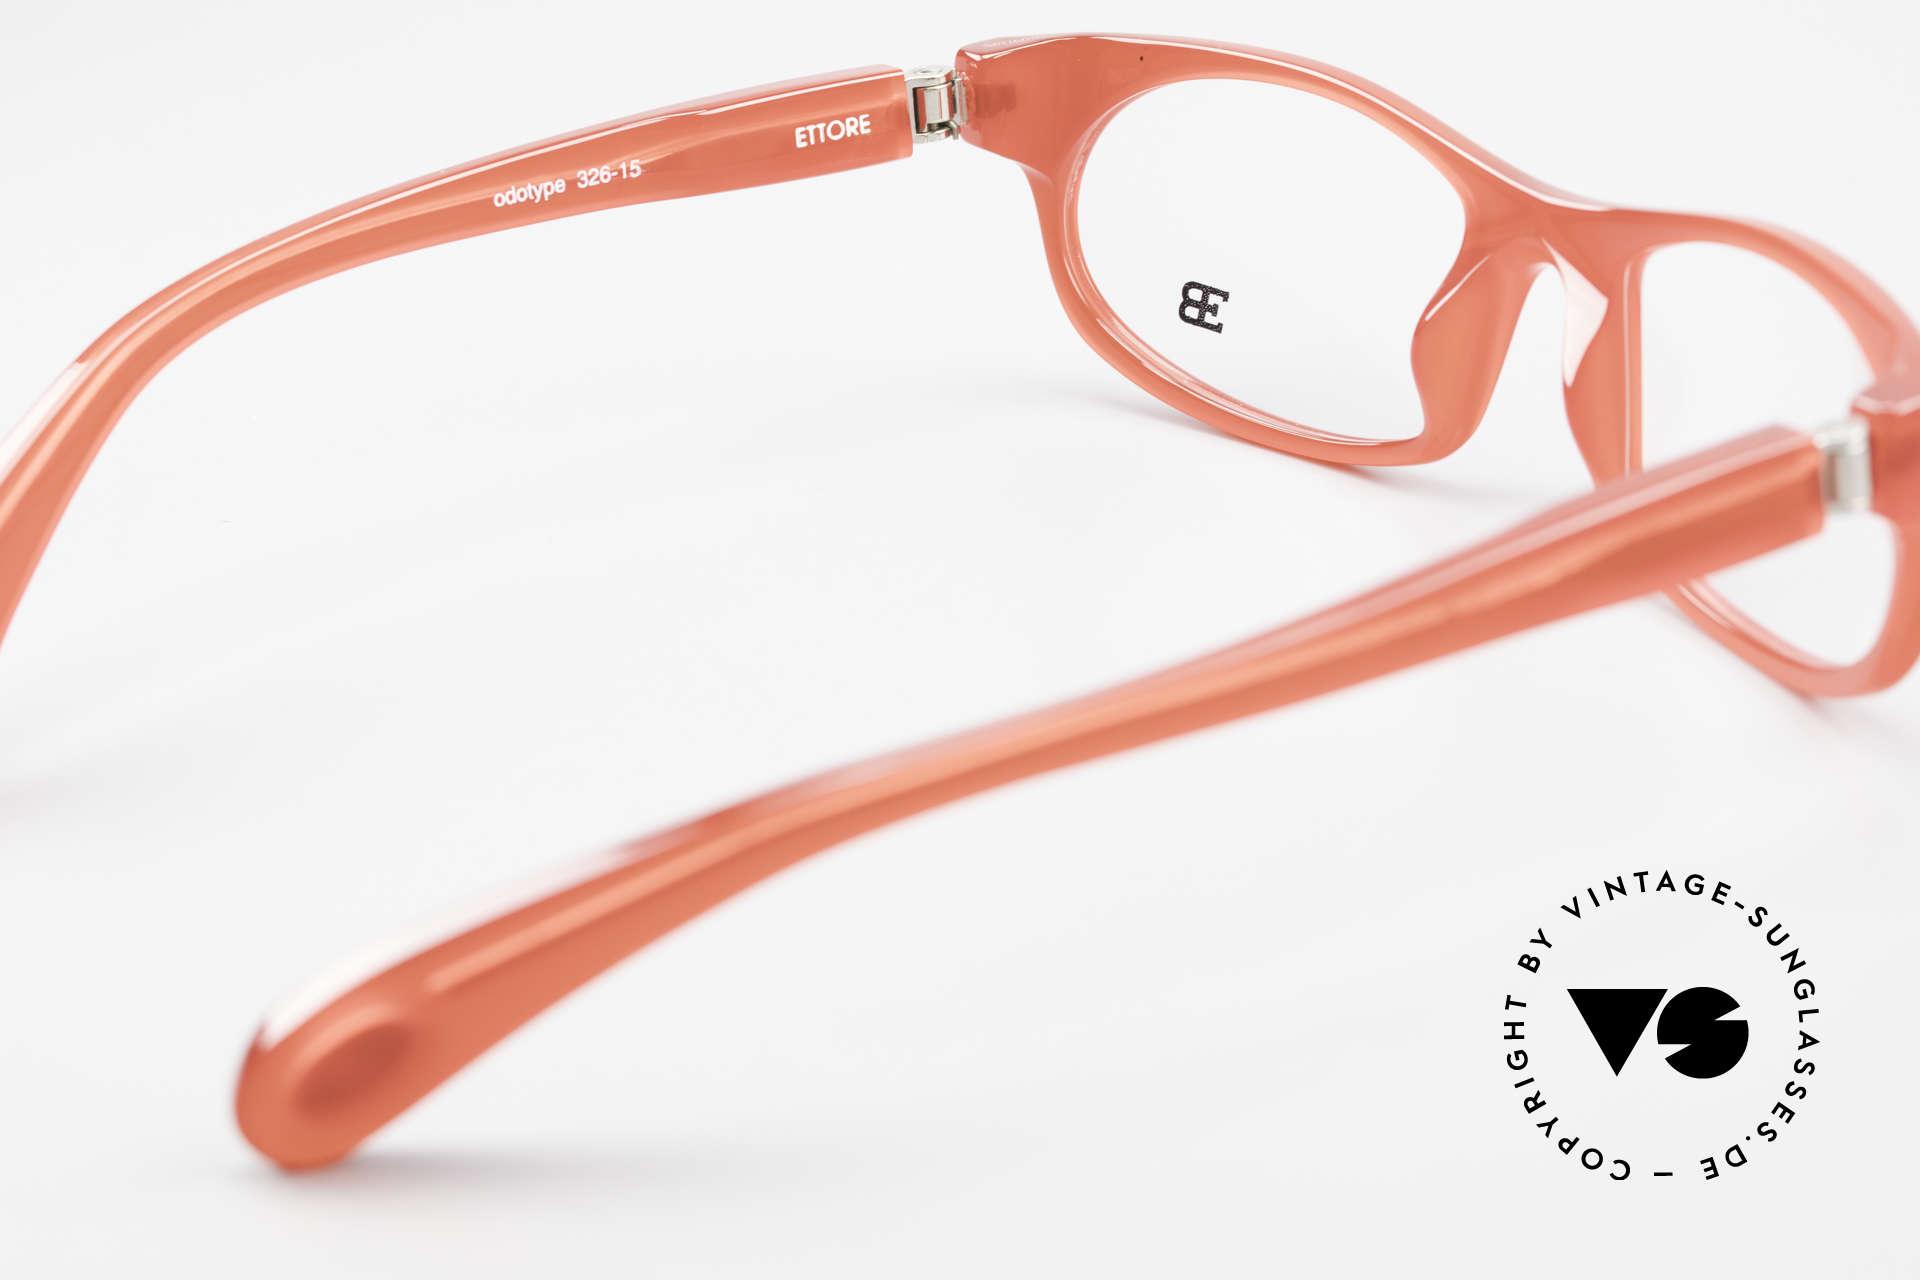 Bugatti 326 Odotype Rare Designer Eyeglass-Frame, bright red frame with original case and box, Made for Men and Women